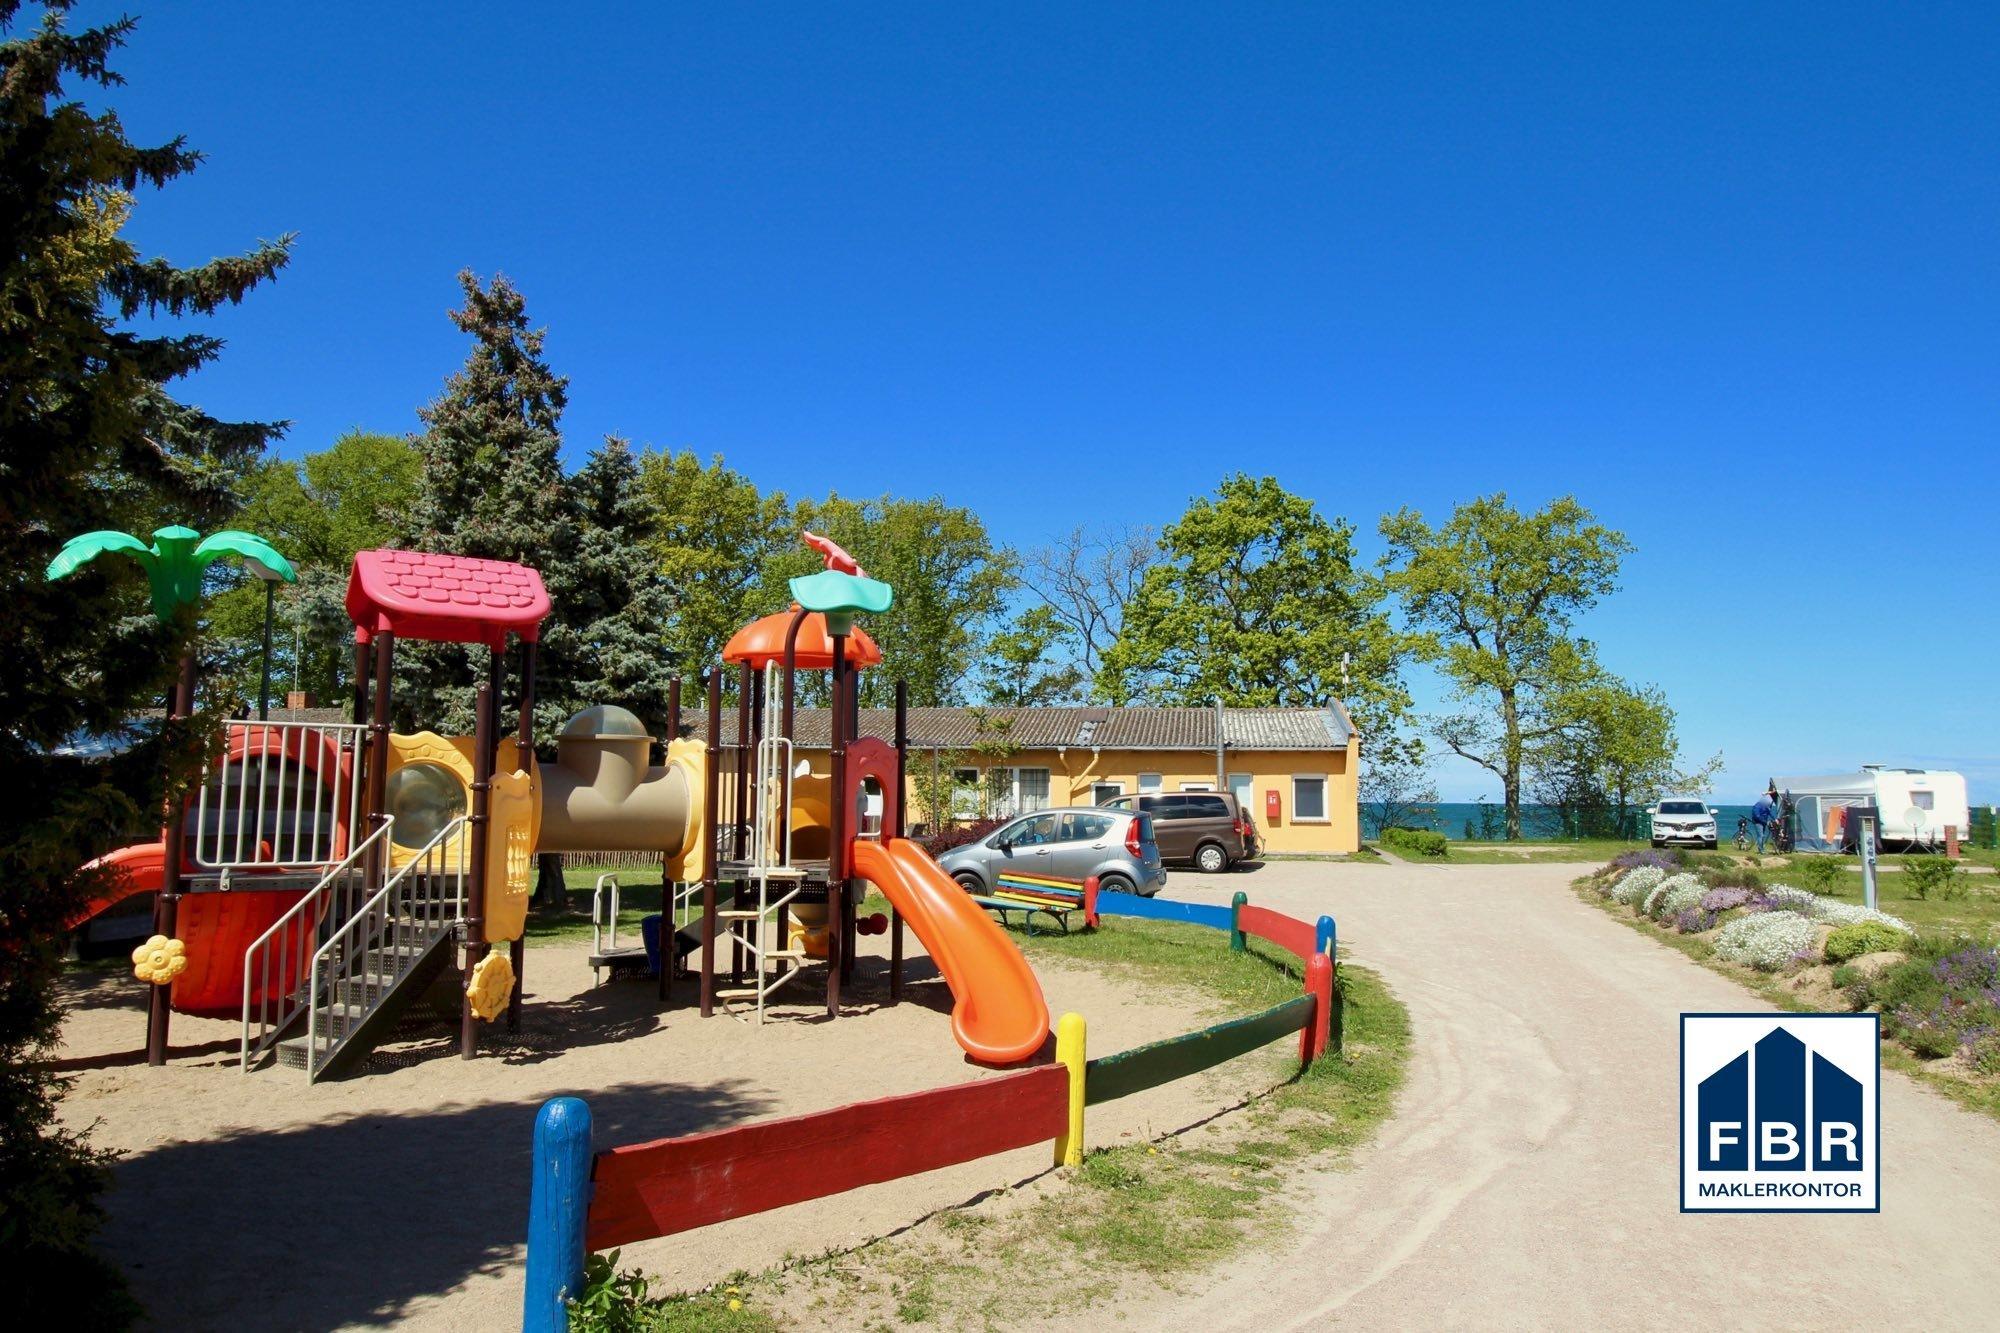 Kinderspielplatz im Umfeld